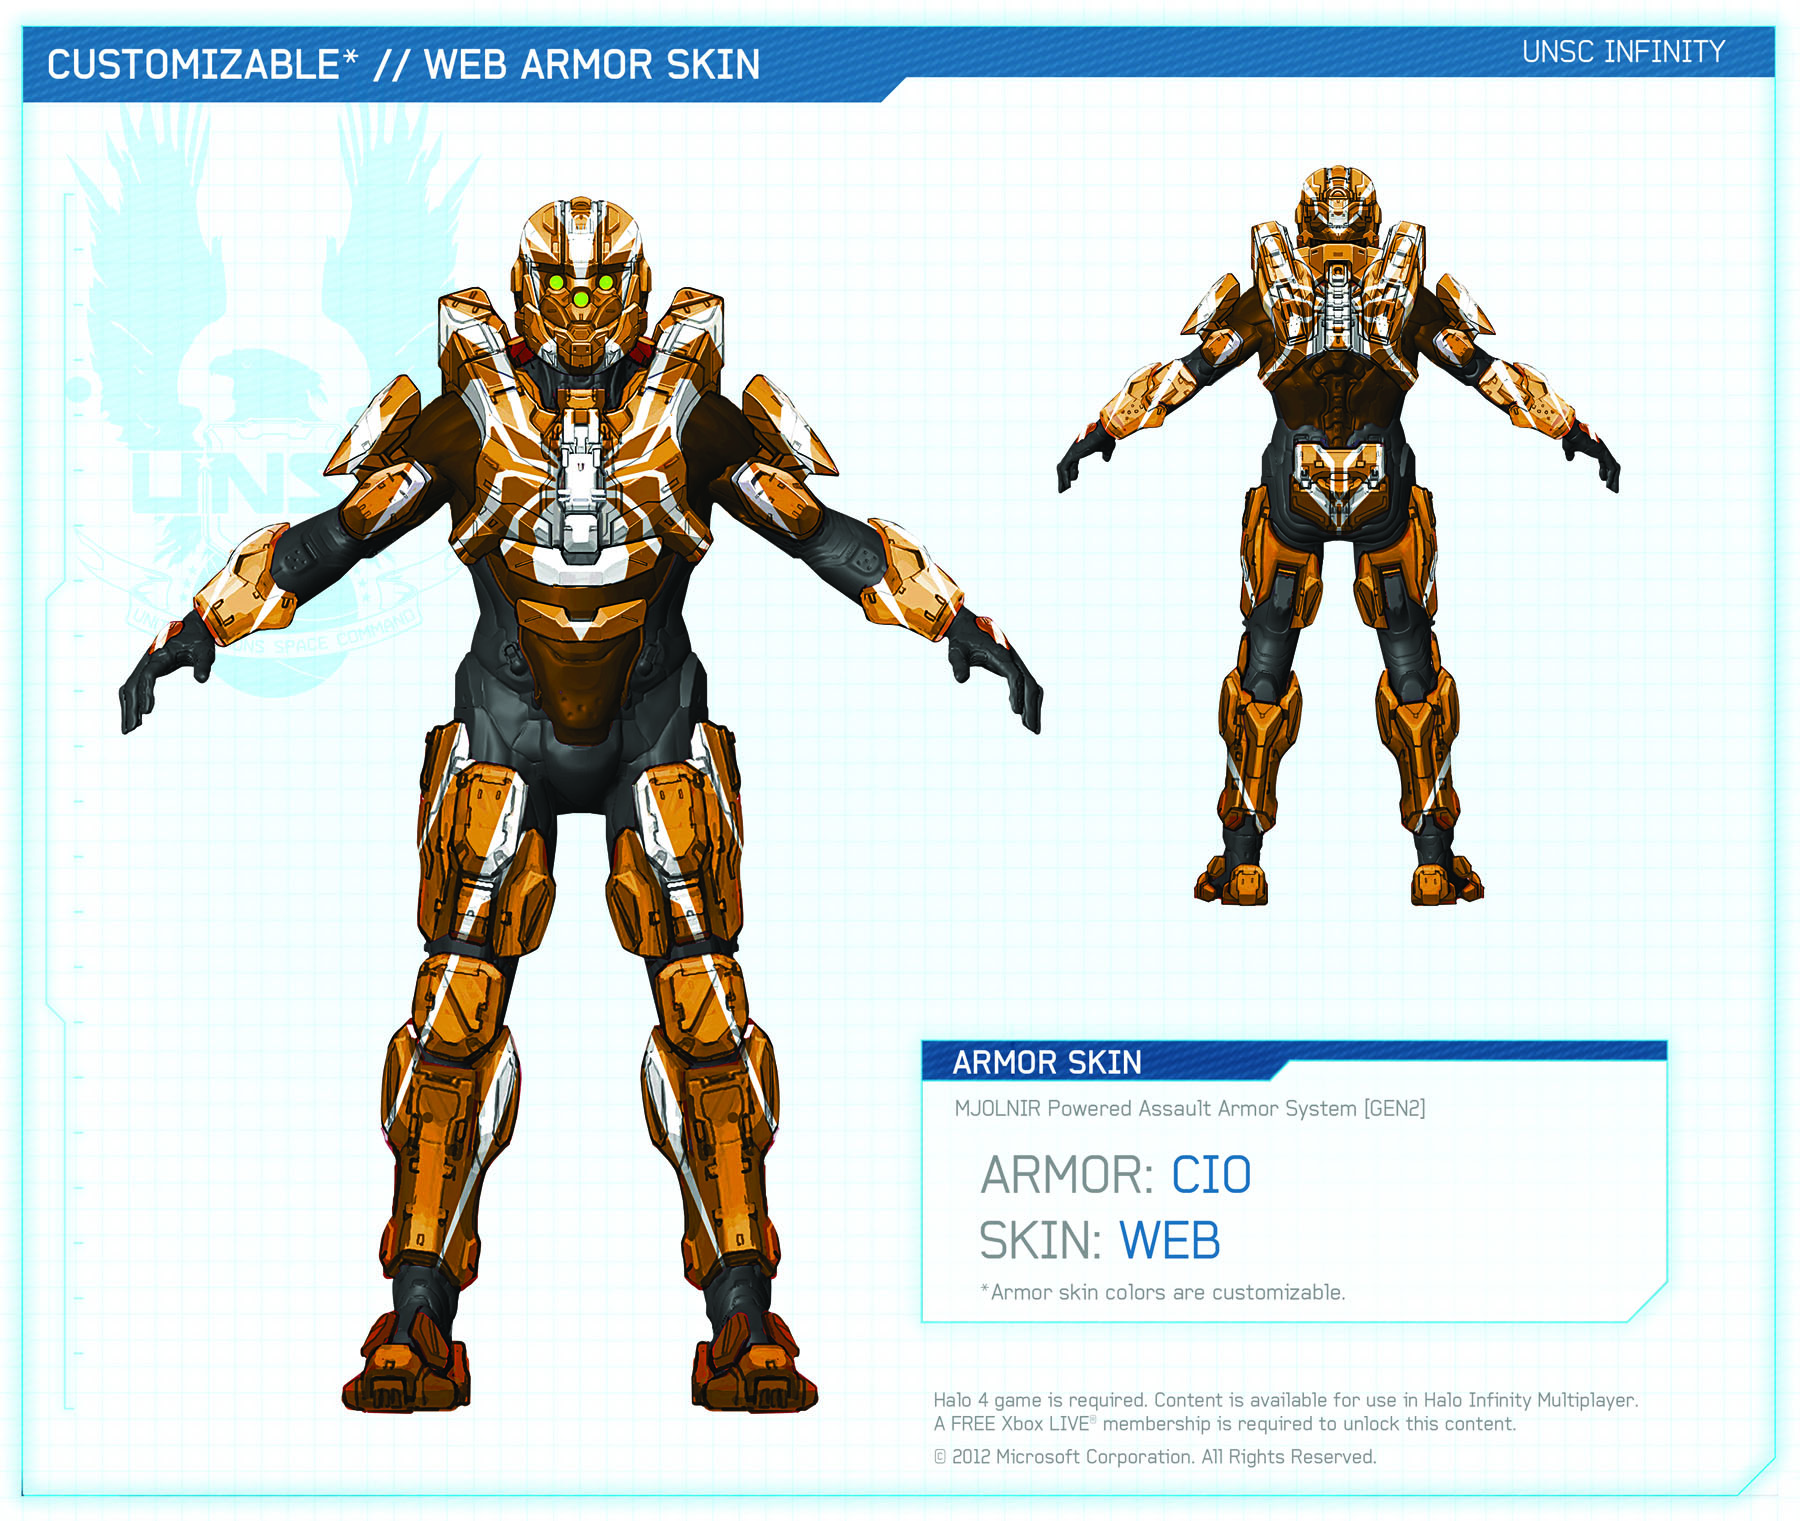 Halo Reach Armor Customizer Halo-4-custom-armor_web